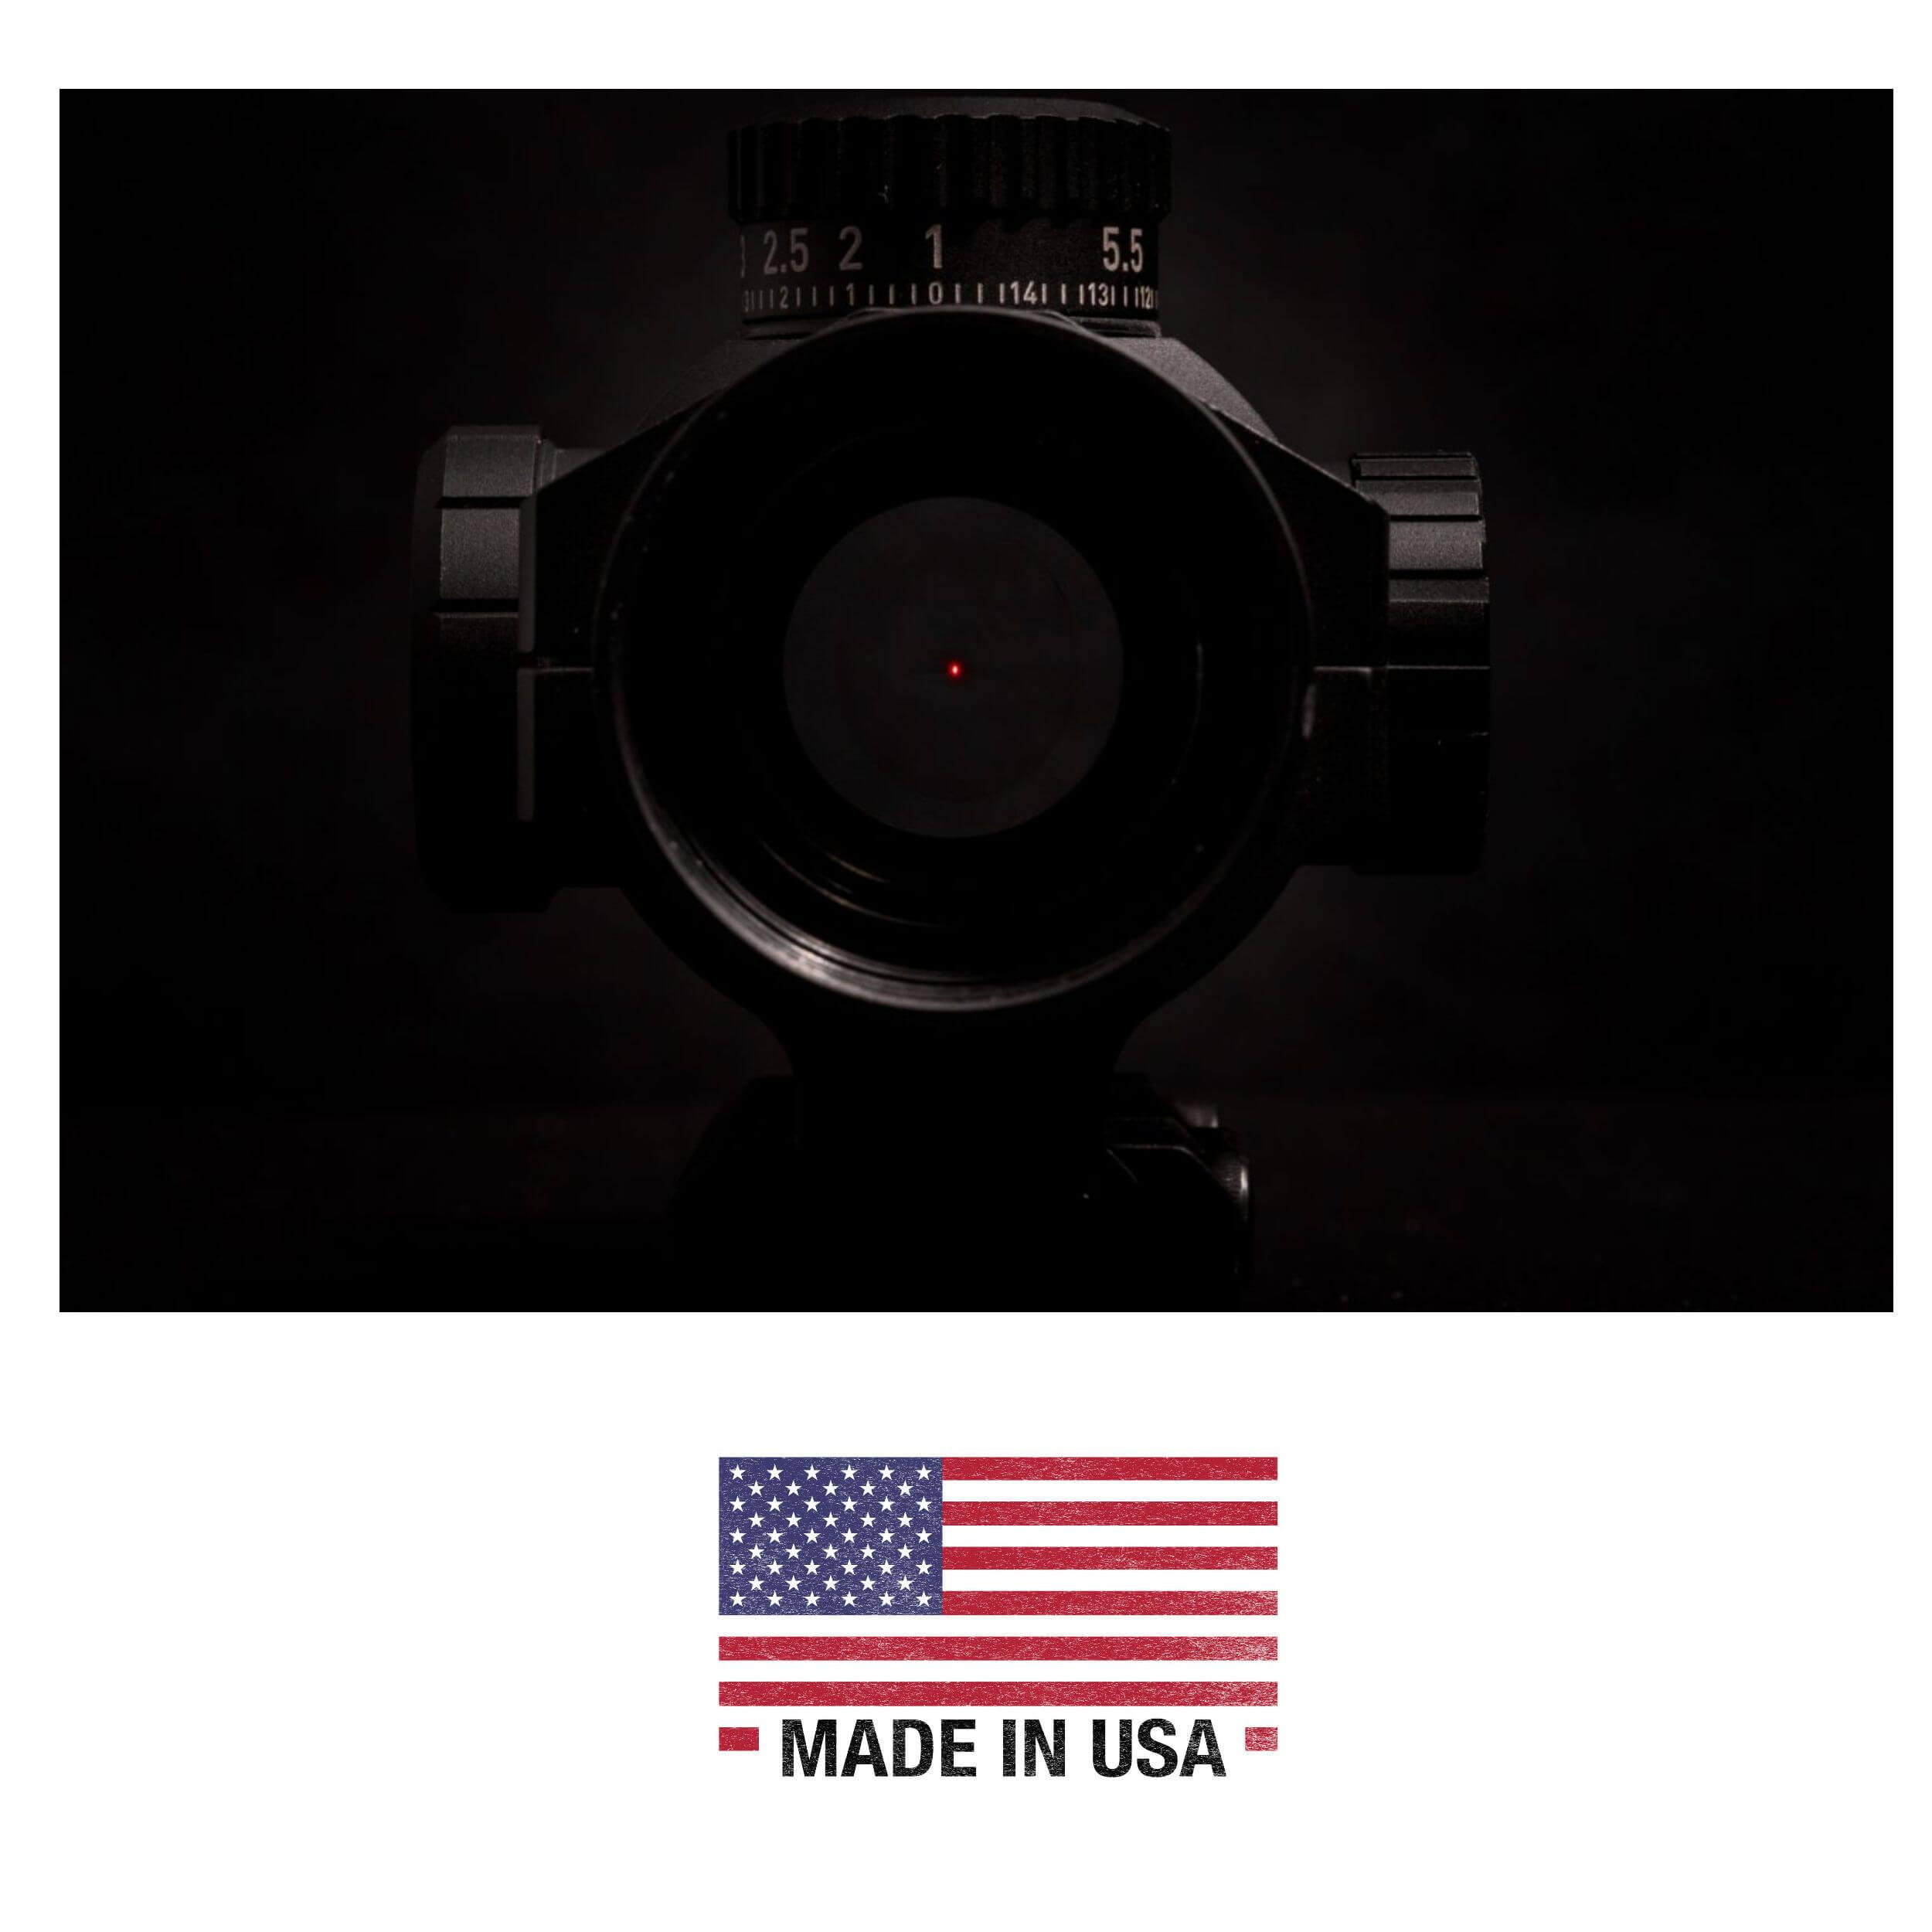 Leupold Freedom RDS Leuchtpunktvisier 1MOA - Red Dot